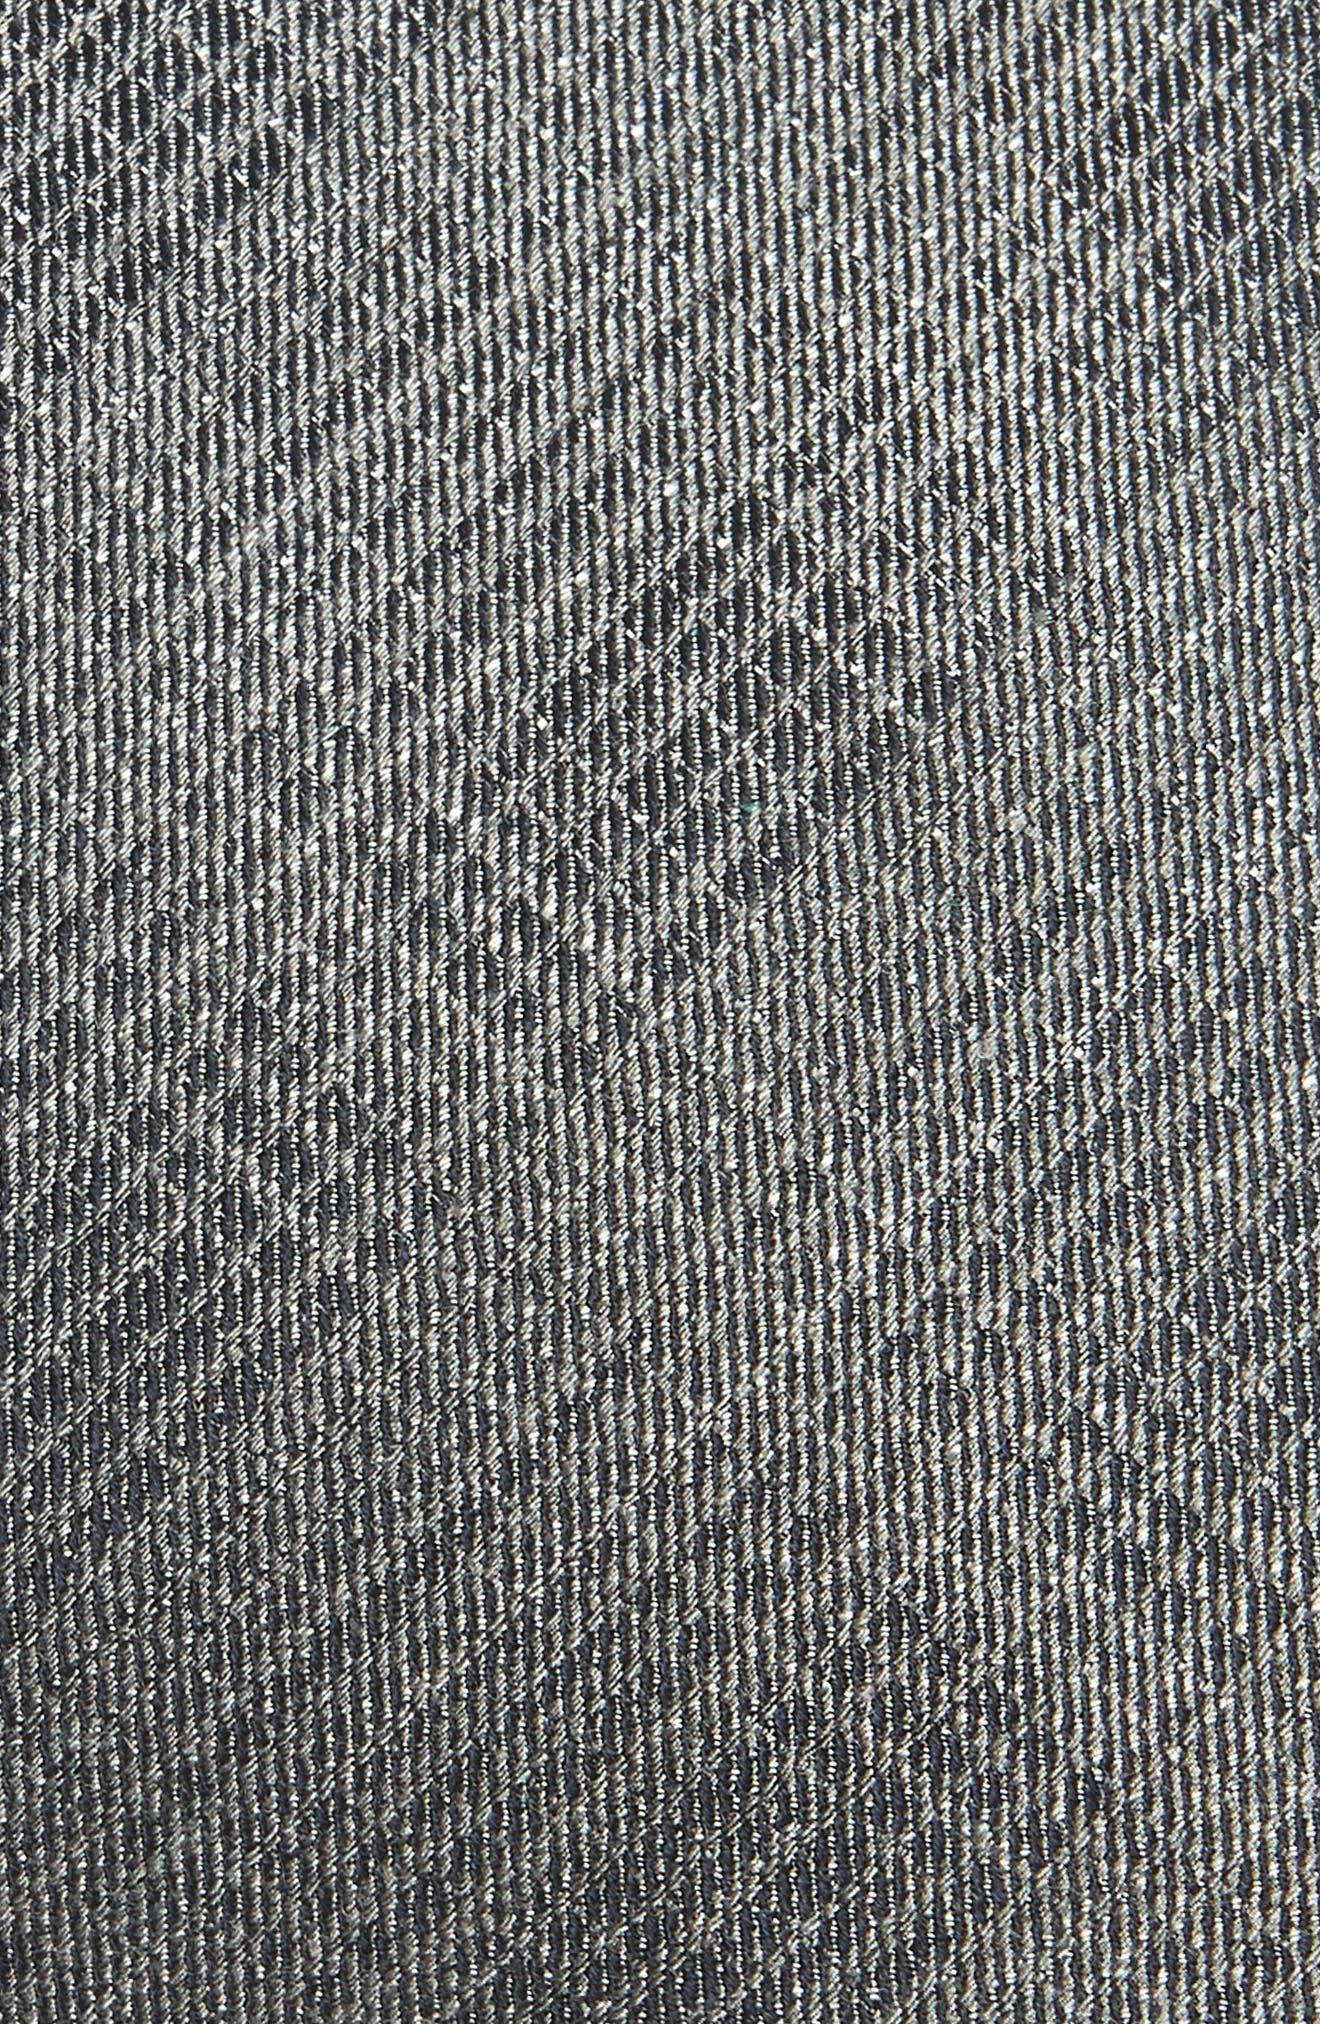 Crosshatch Tie,                             Alternate thumbnail 2, color,                             SILVER GREY